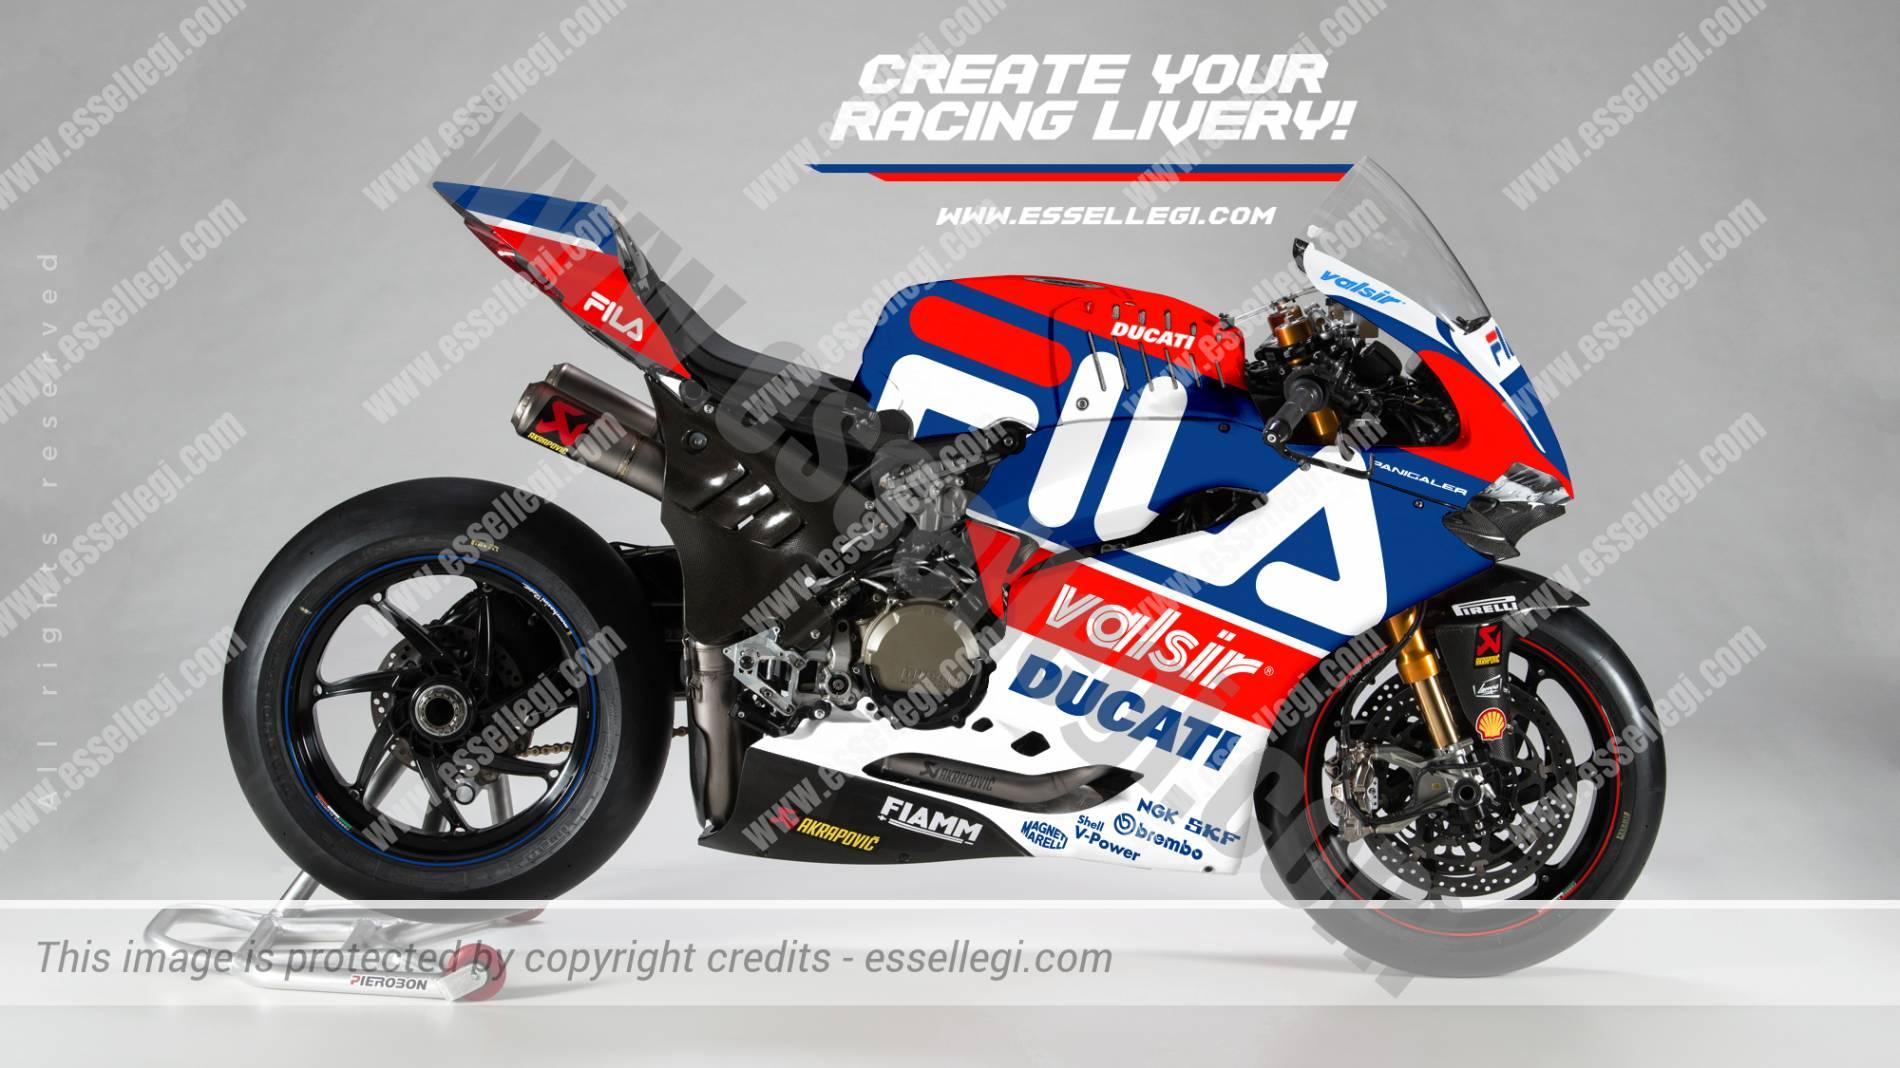 Ducati 1299 Panigale R | Fila Tribute Racing Bike Livery. Racing Bike Liveries, Bike Livery, Bike Liveries, Motorsport Livery, Motorsport Liveries, Race Bike Livery, Race Bike Liveries